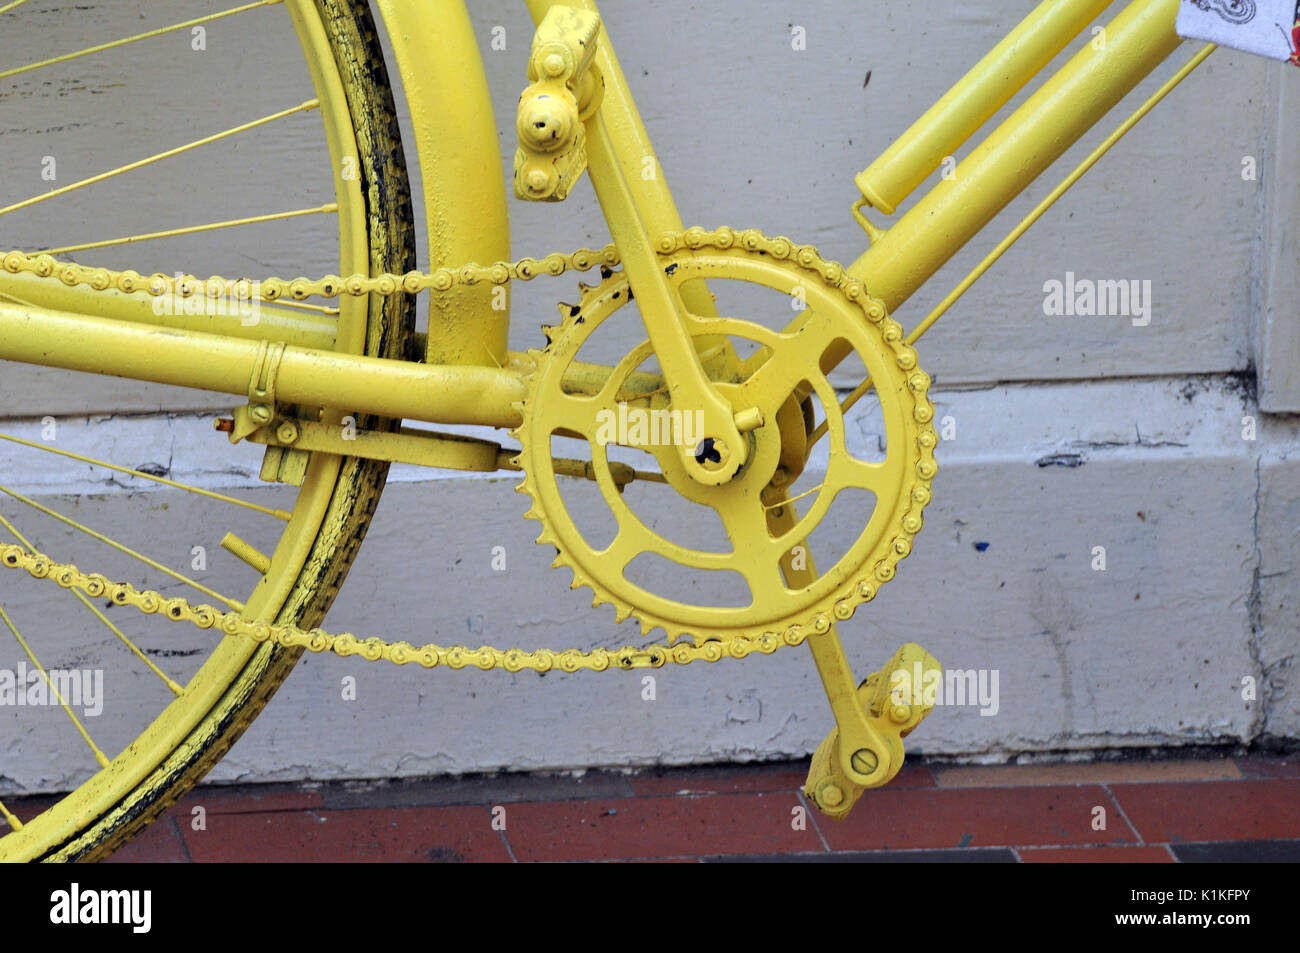 Bicycle Frames Stockfotos & Bicycle Frames Bilder - Alamy